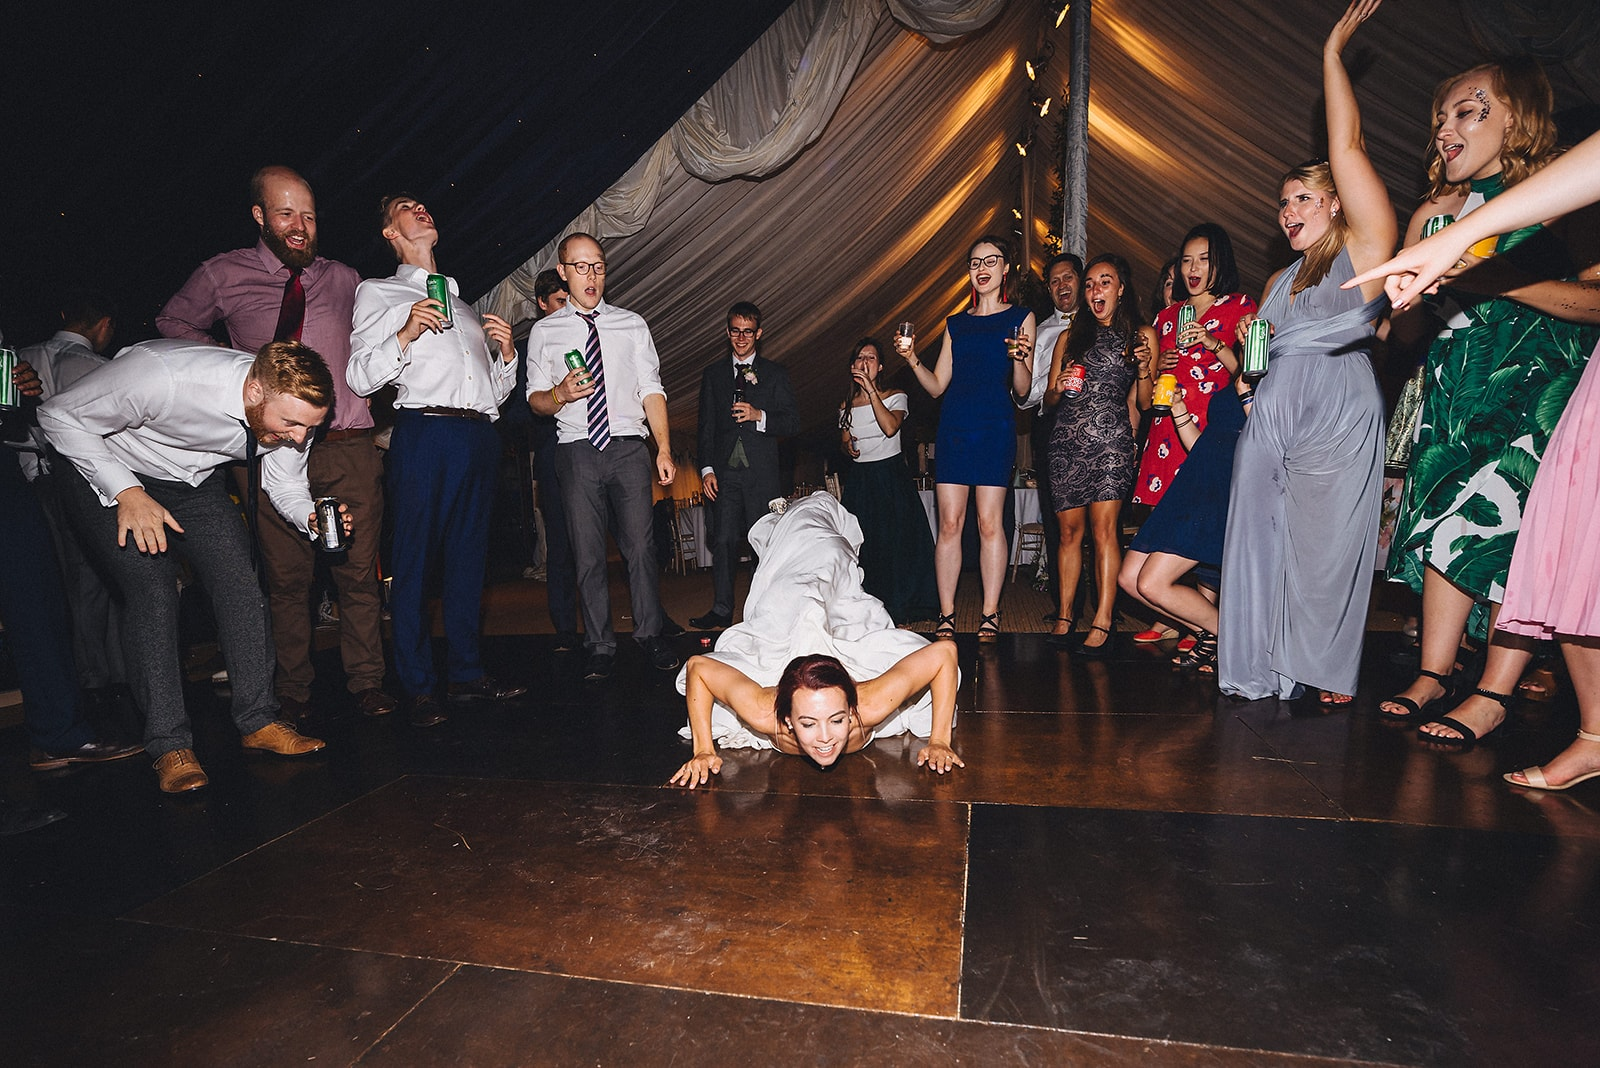 Bride doing the worm on the dance floor at her joyful cambridge farm marquee wedding